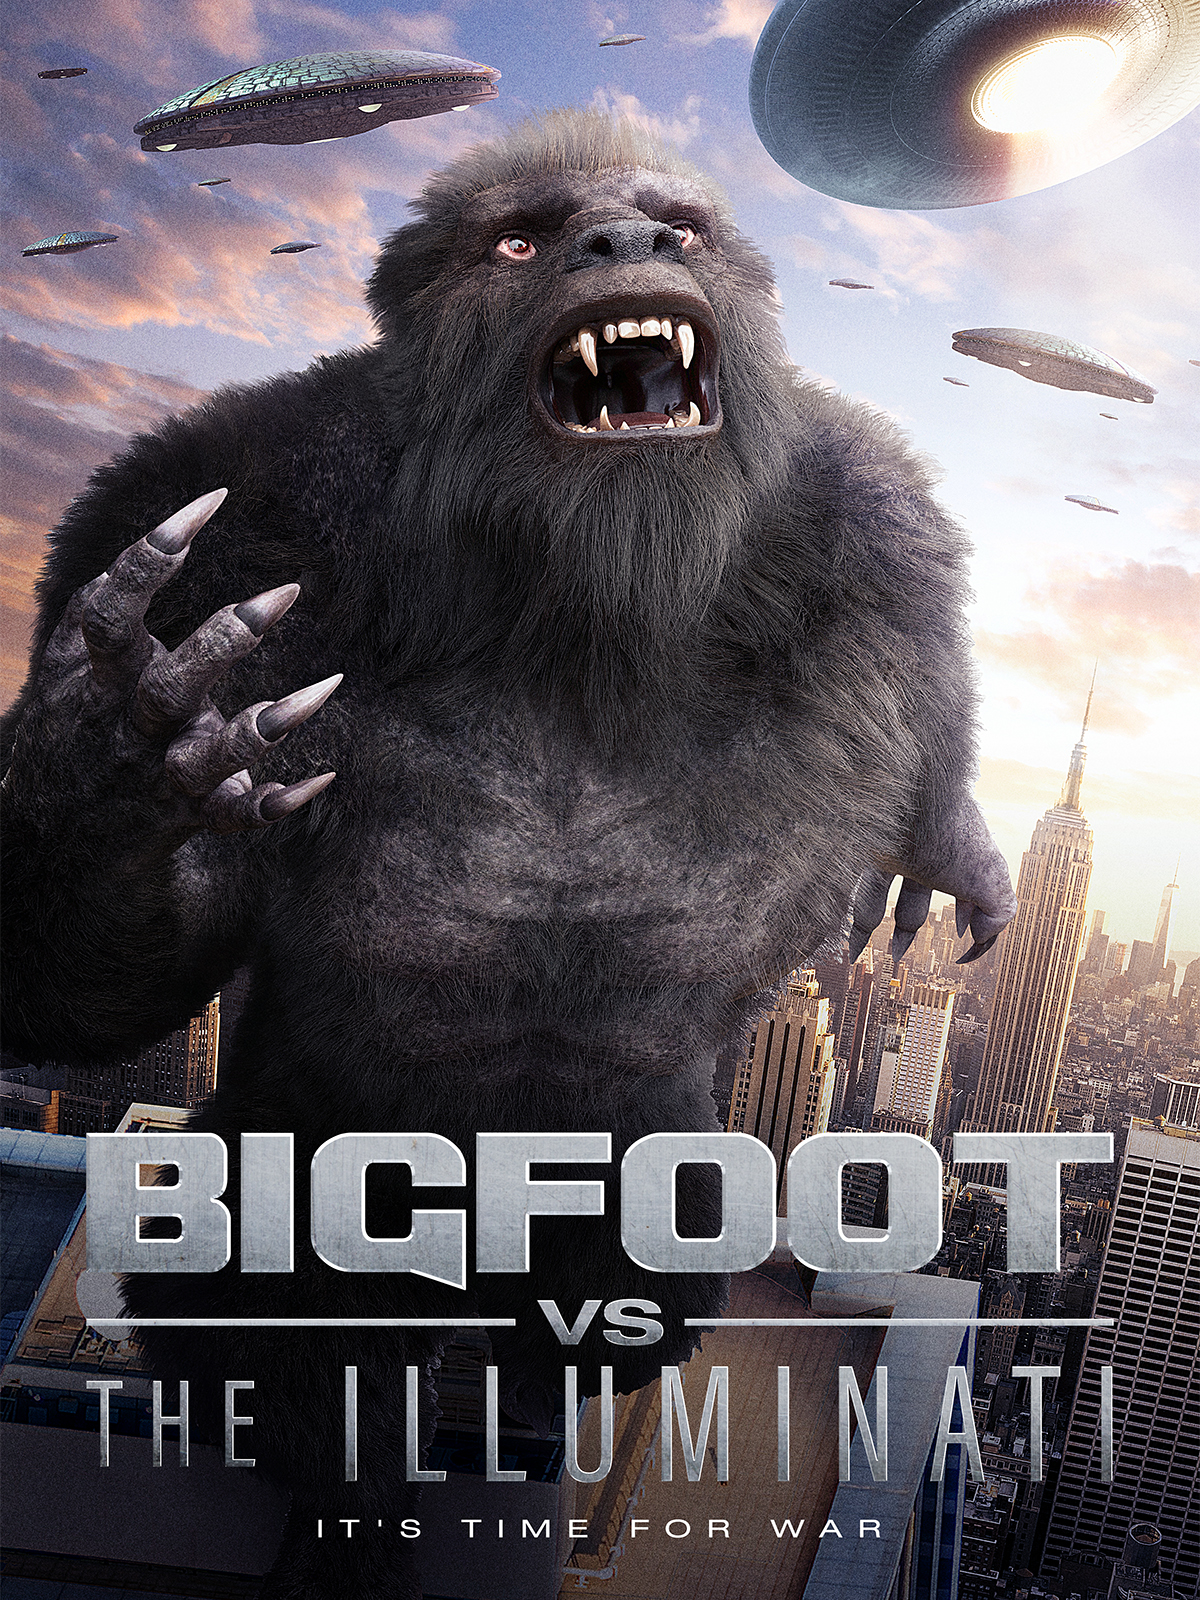 watch Bigfoot vs the Illuminati on soap2day